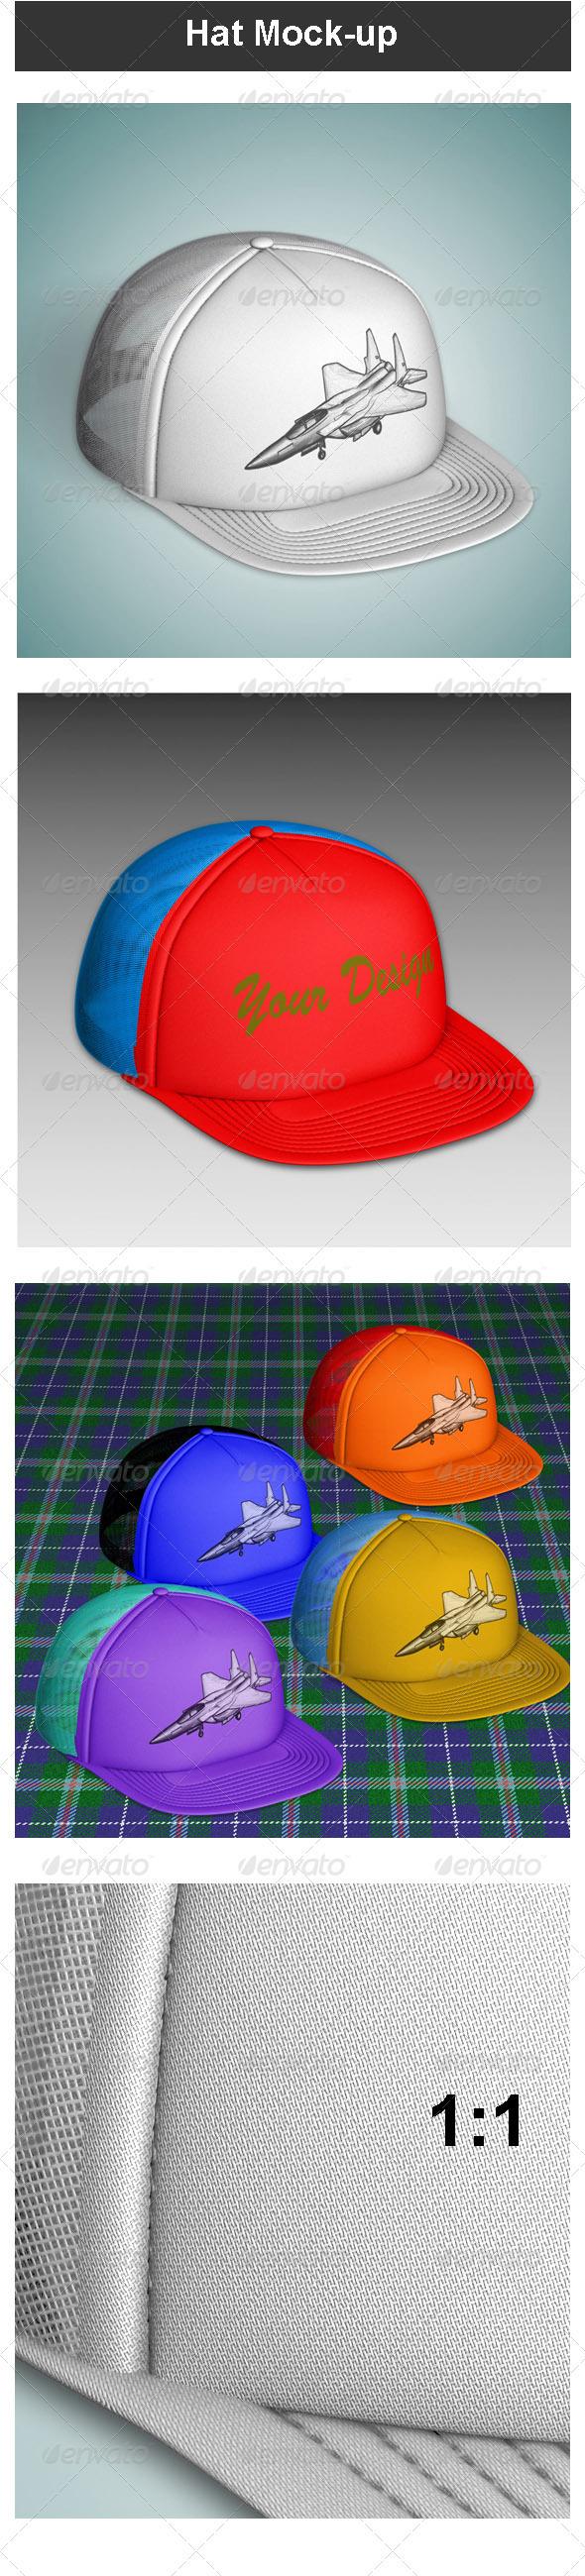 GraphicRiver Hat Mock-up 3670504